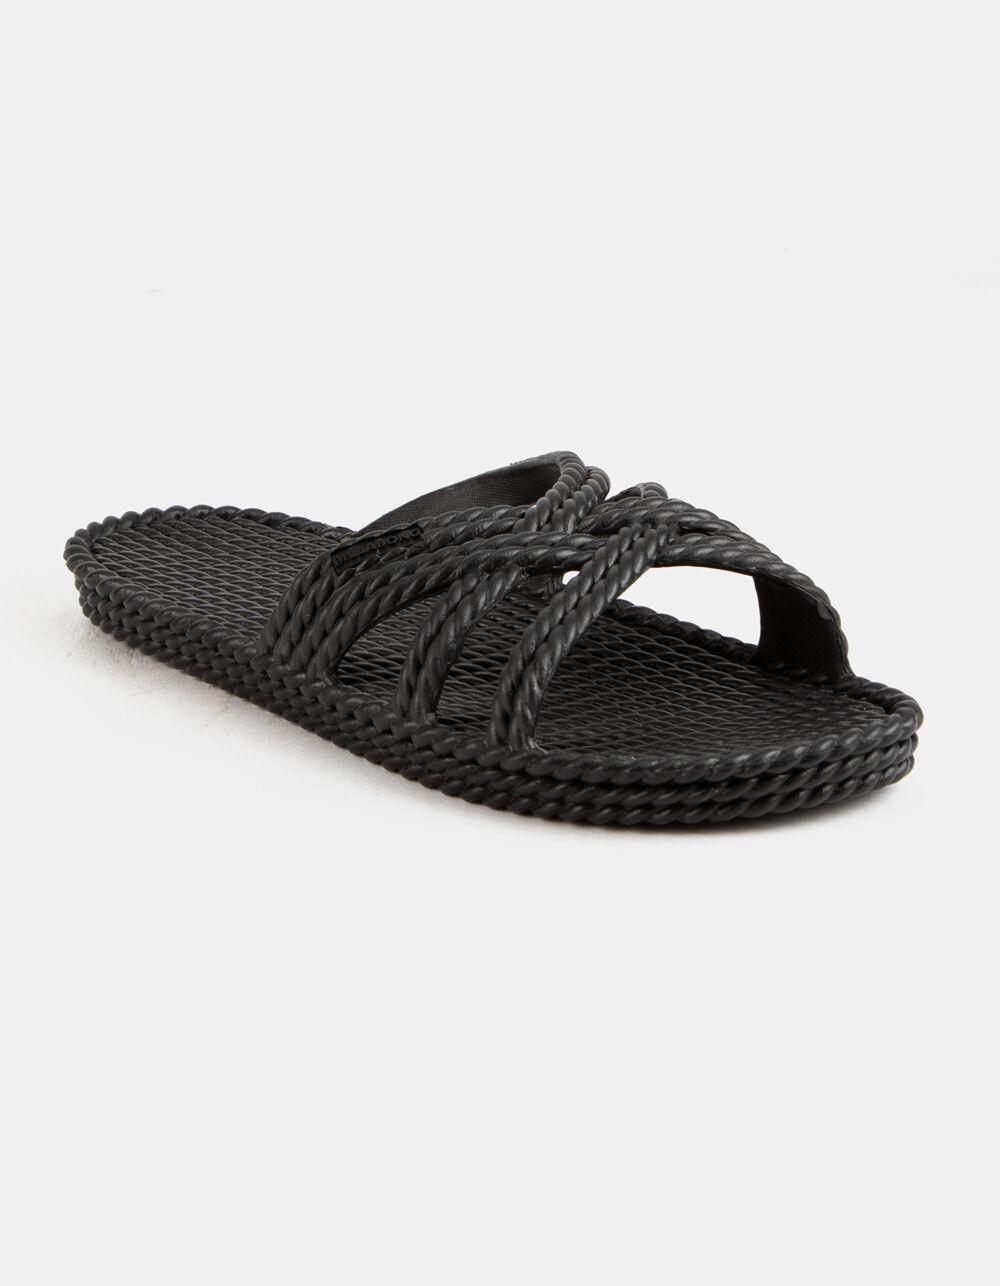 BILLABONG Slippin Slide Black Sandals